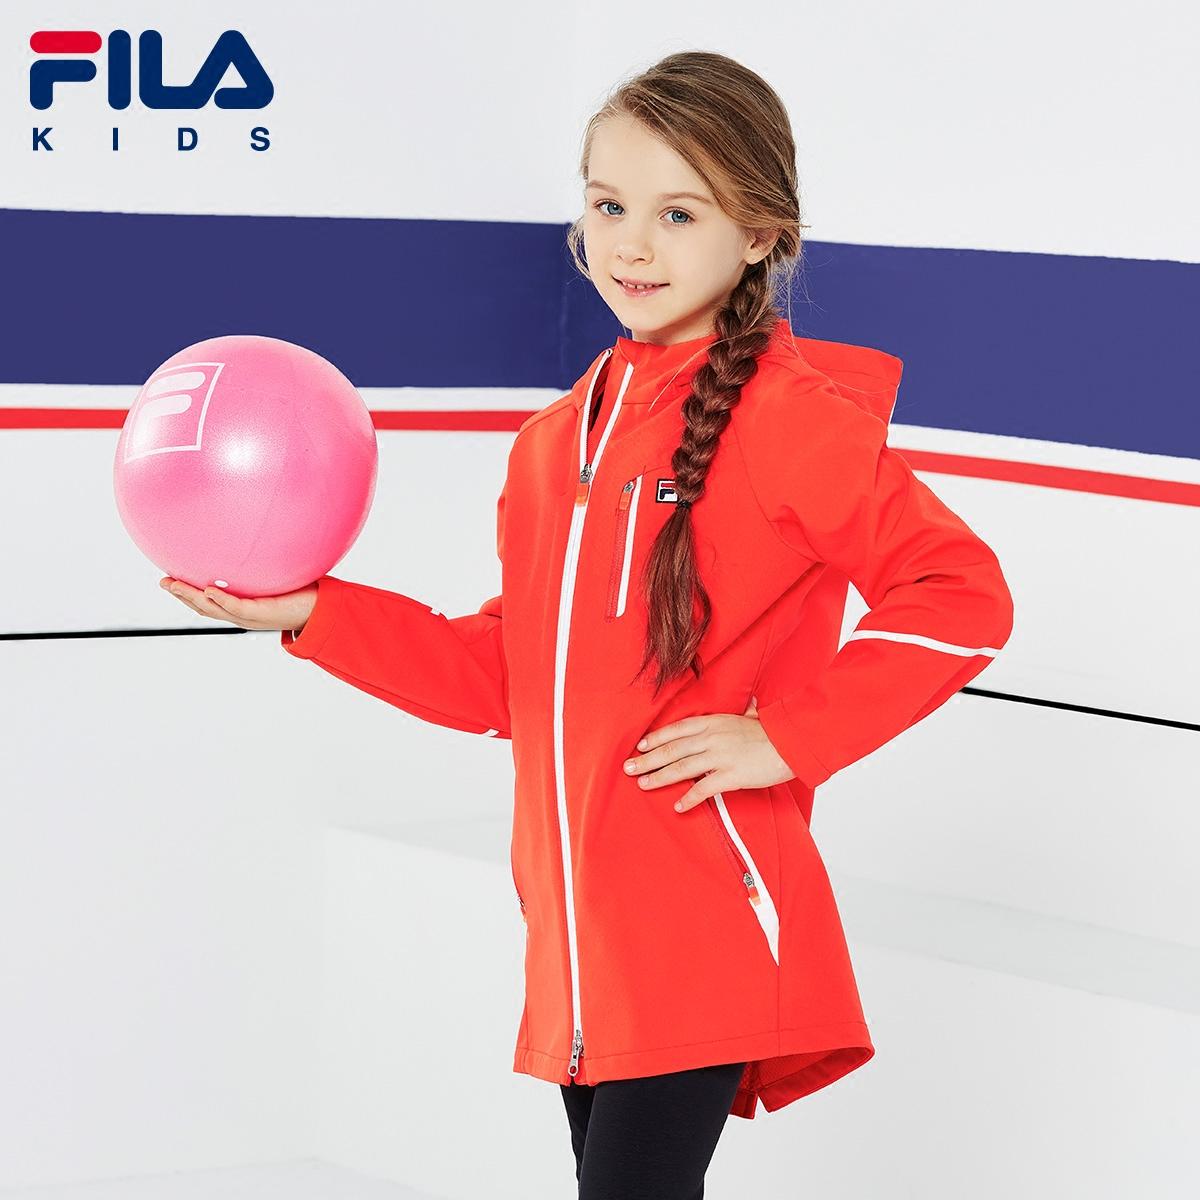 FILA斐乐童装女童外套防风保暖连帽拉链梭织夹克上衣2018秋冬新款